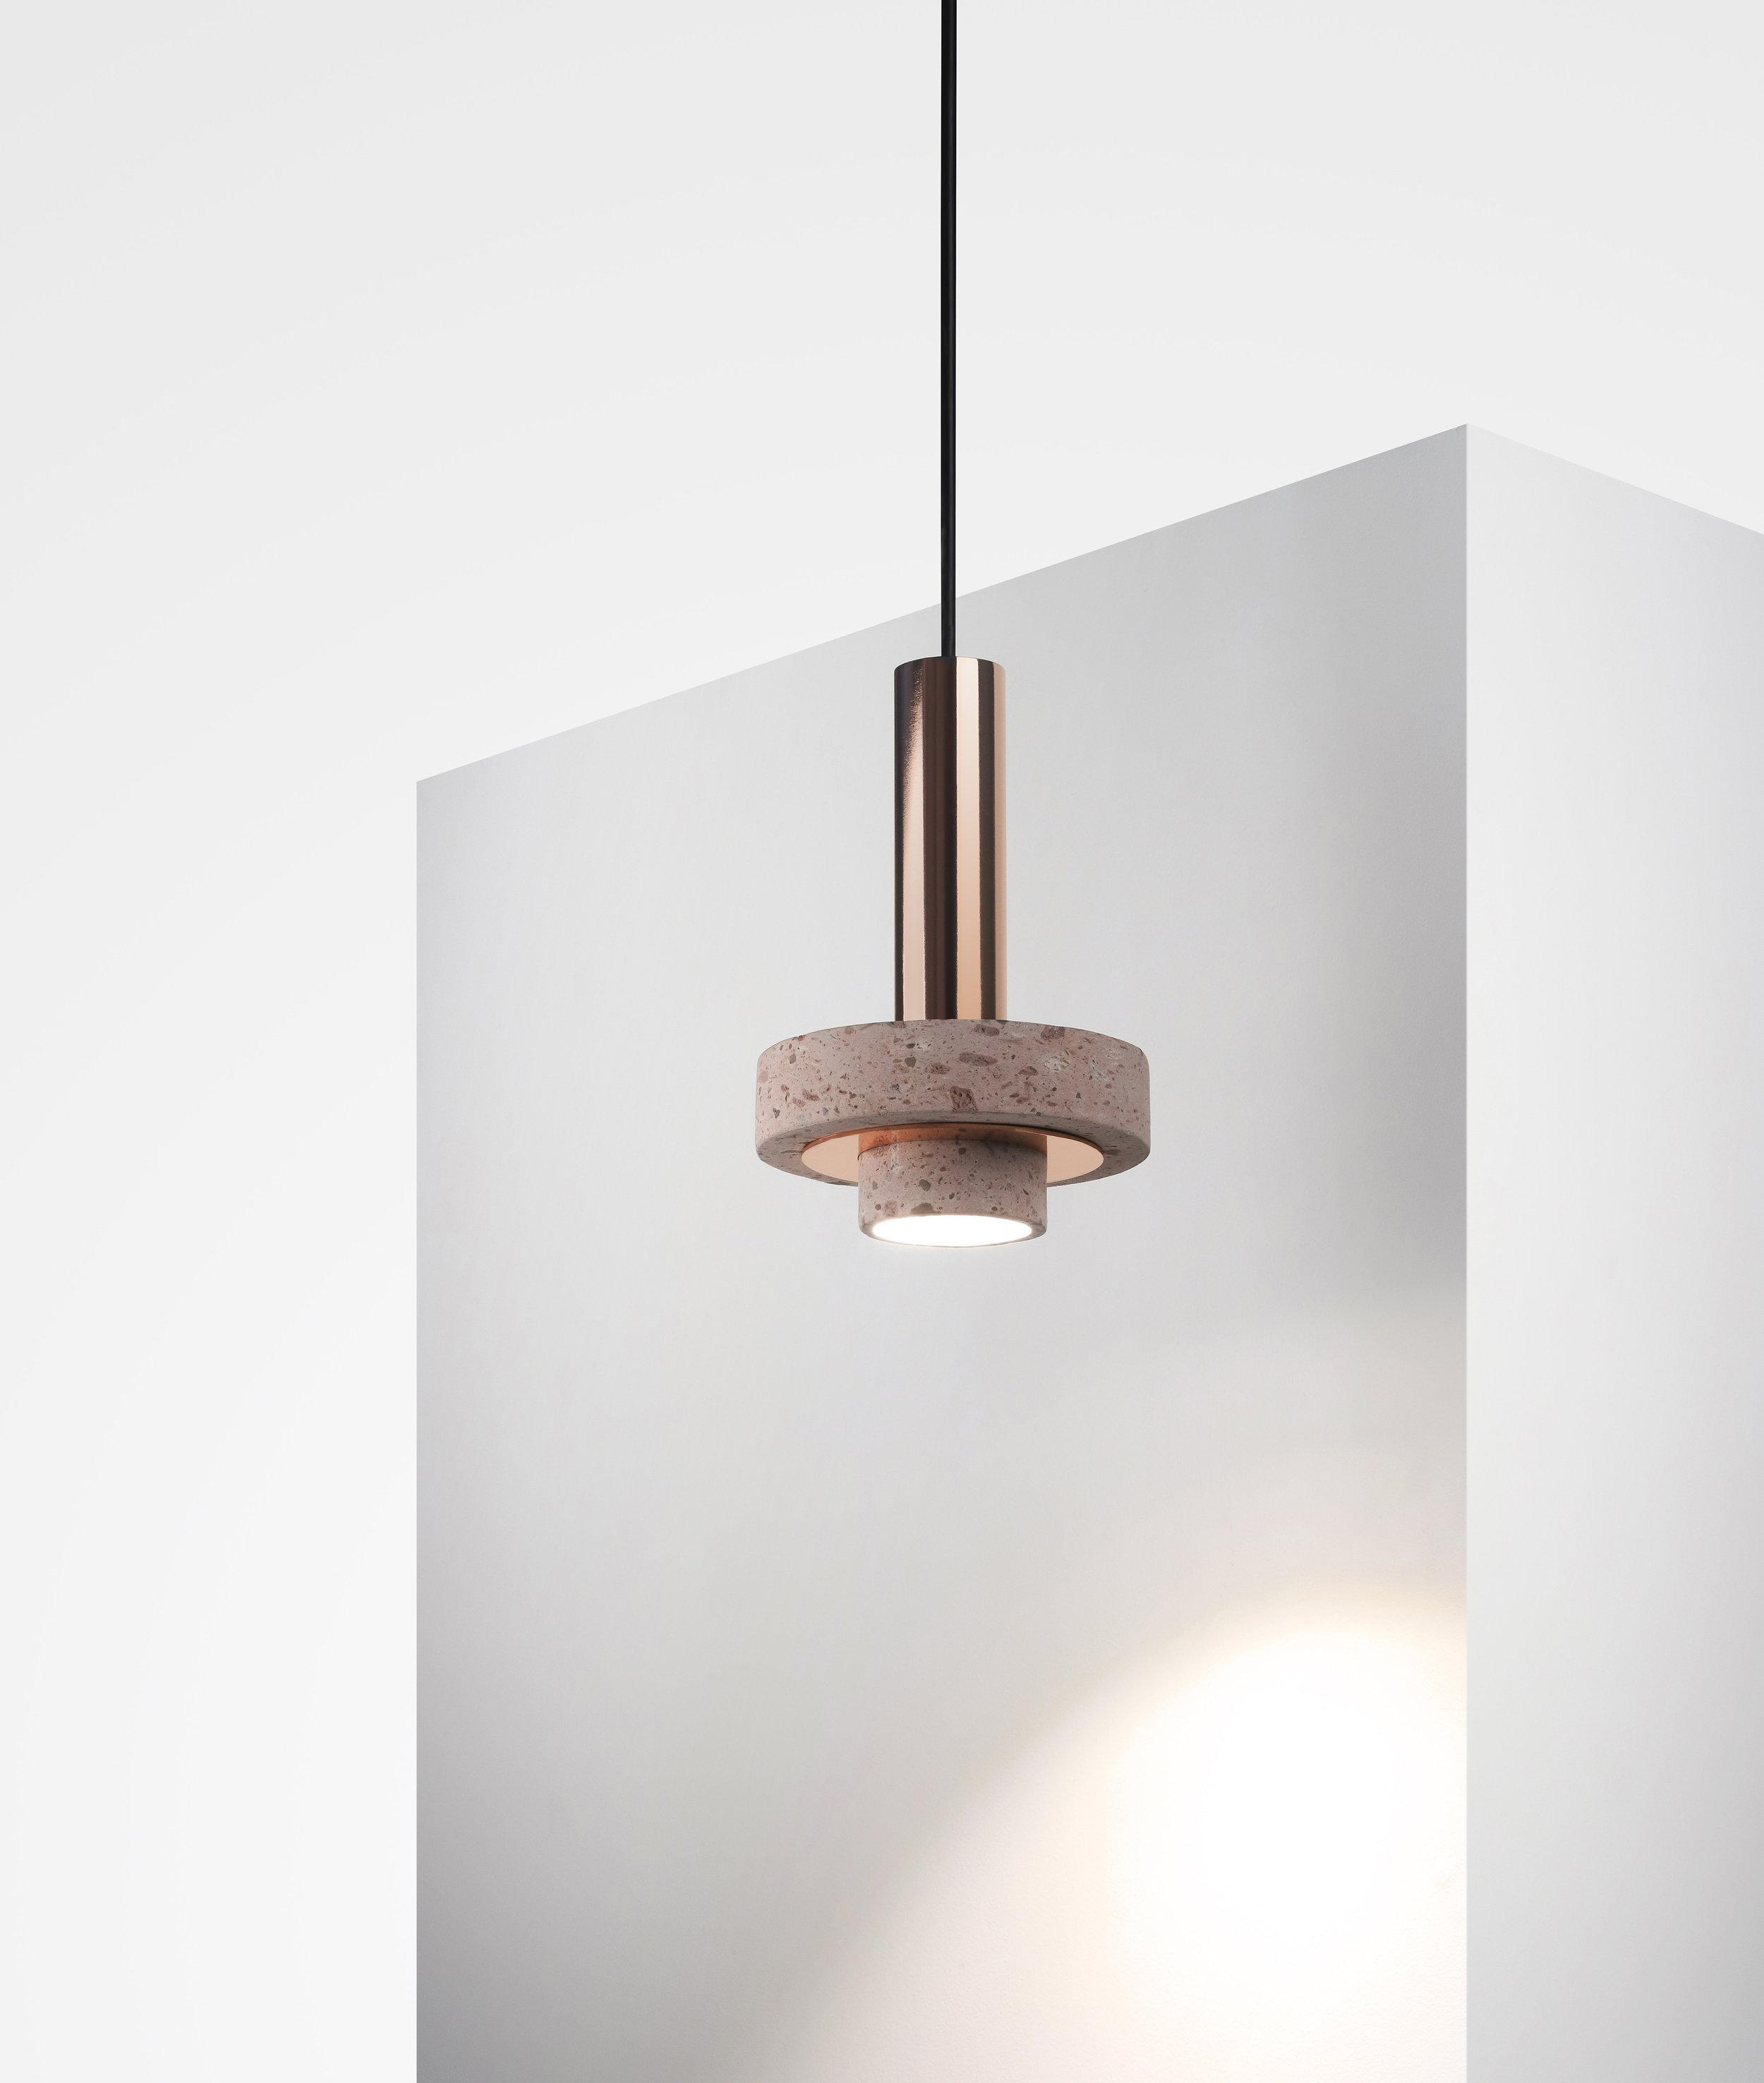 Ambra pendant by  Studio davidpompa